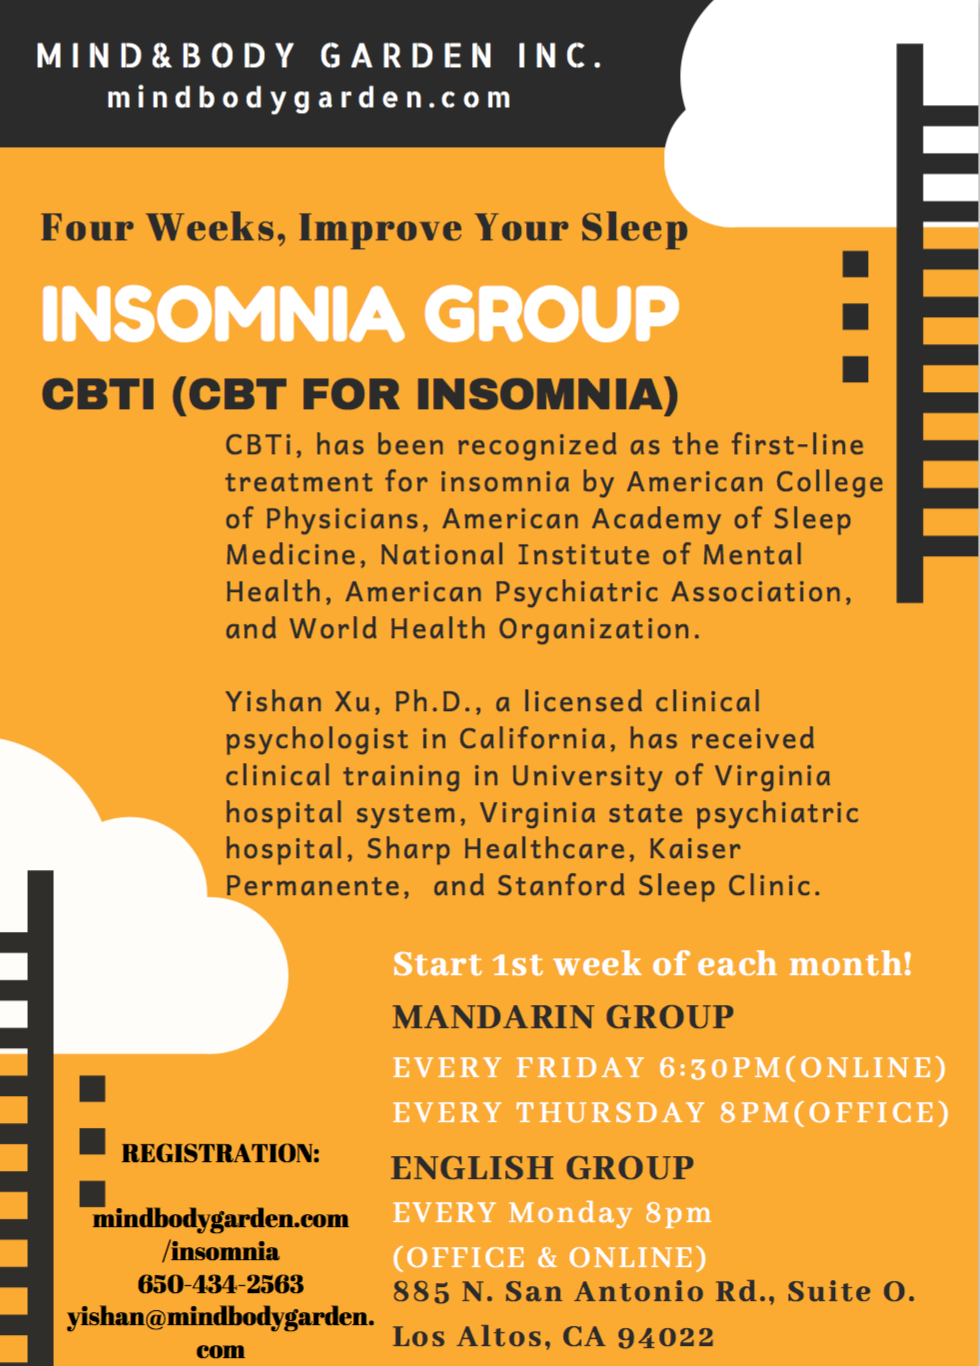 Mandarin-English Insomnia Group